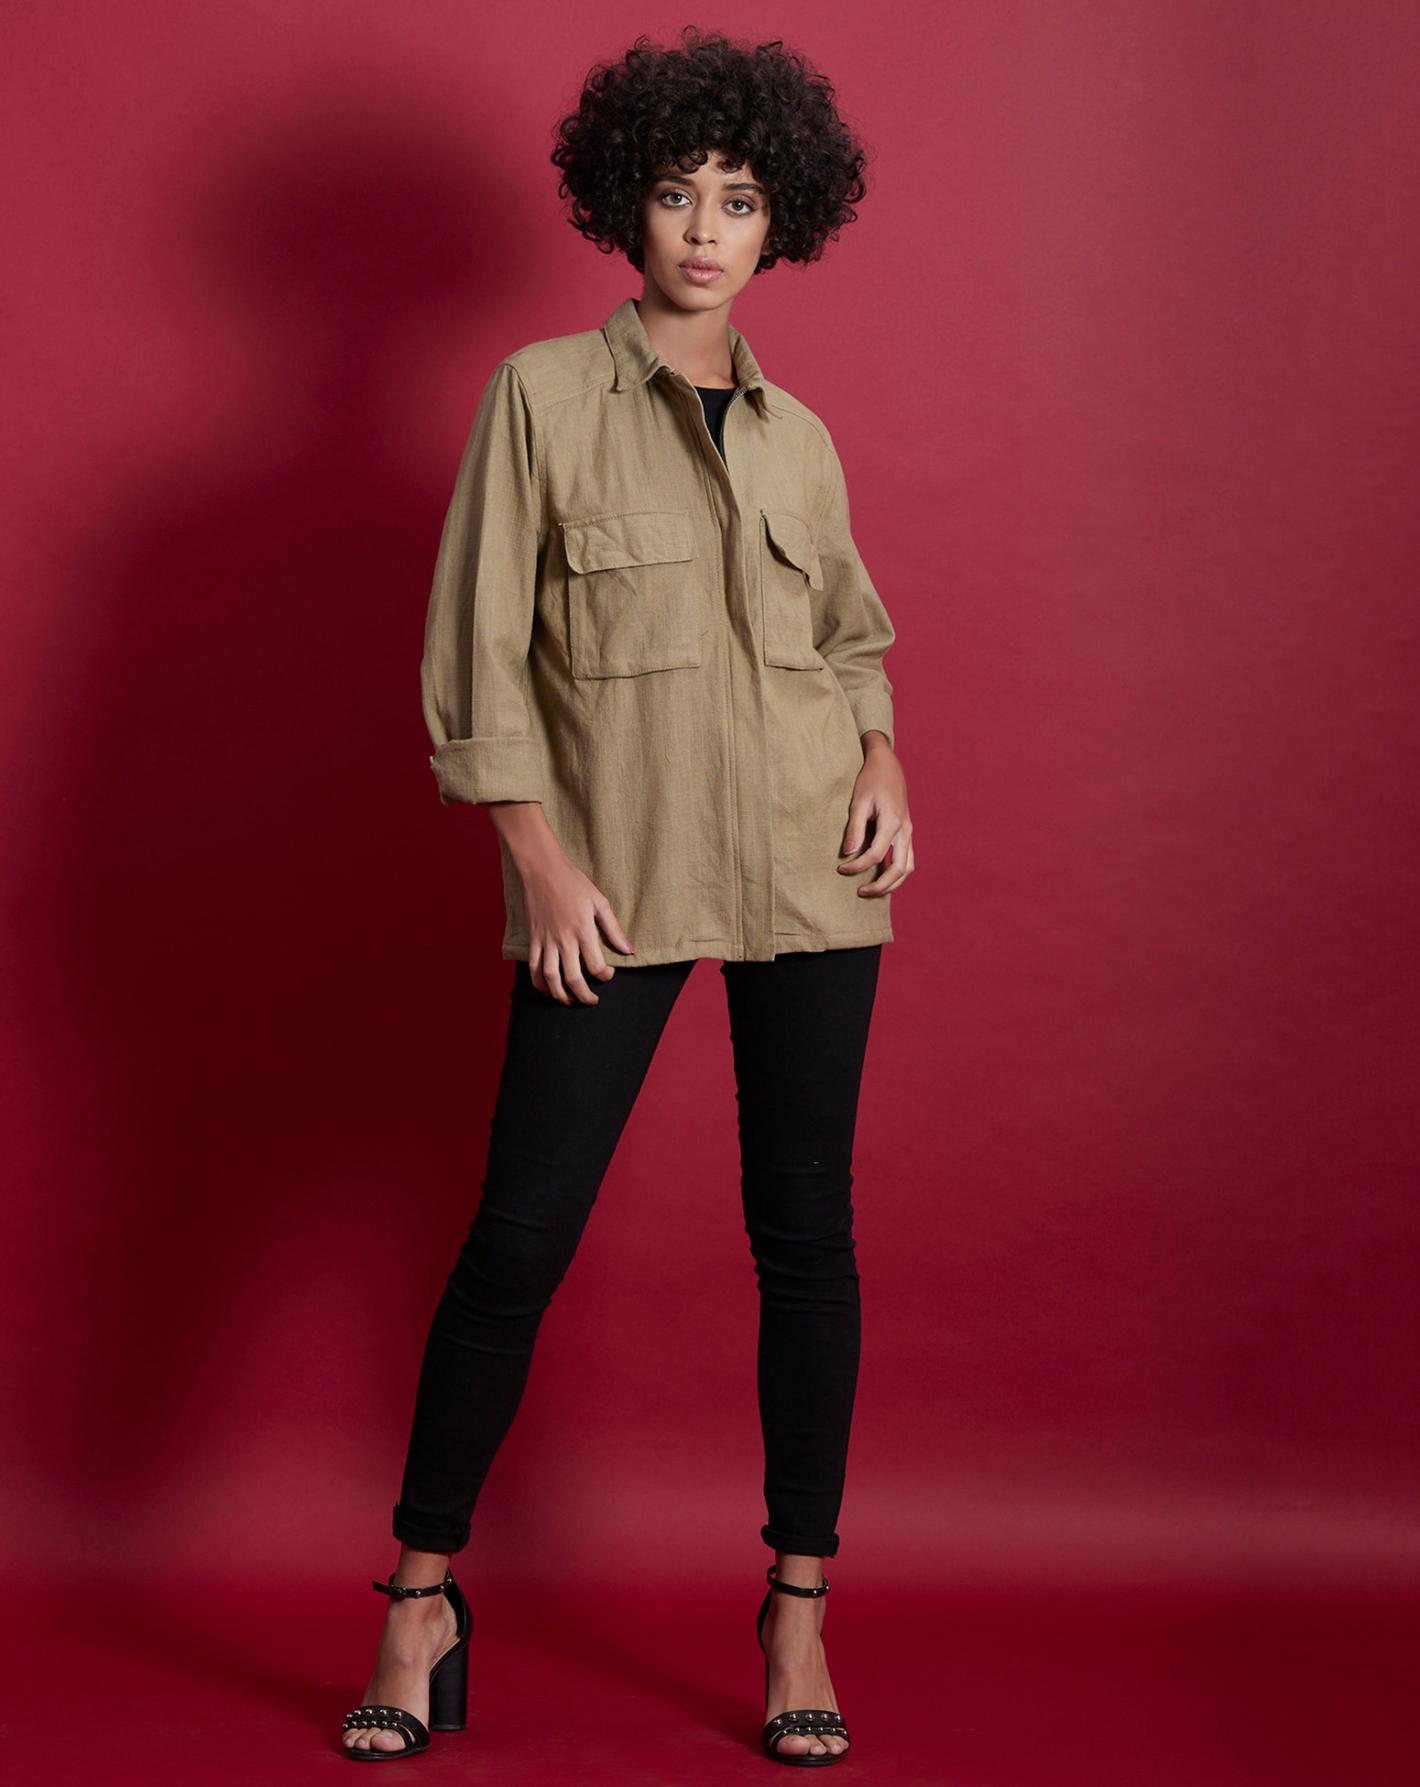 Khaki Cotton Jaket with Pocket Details on front